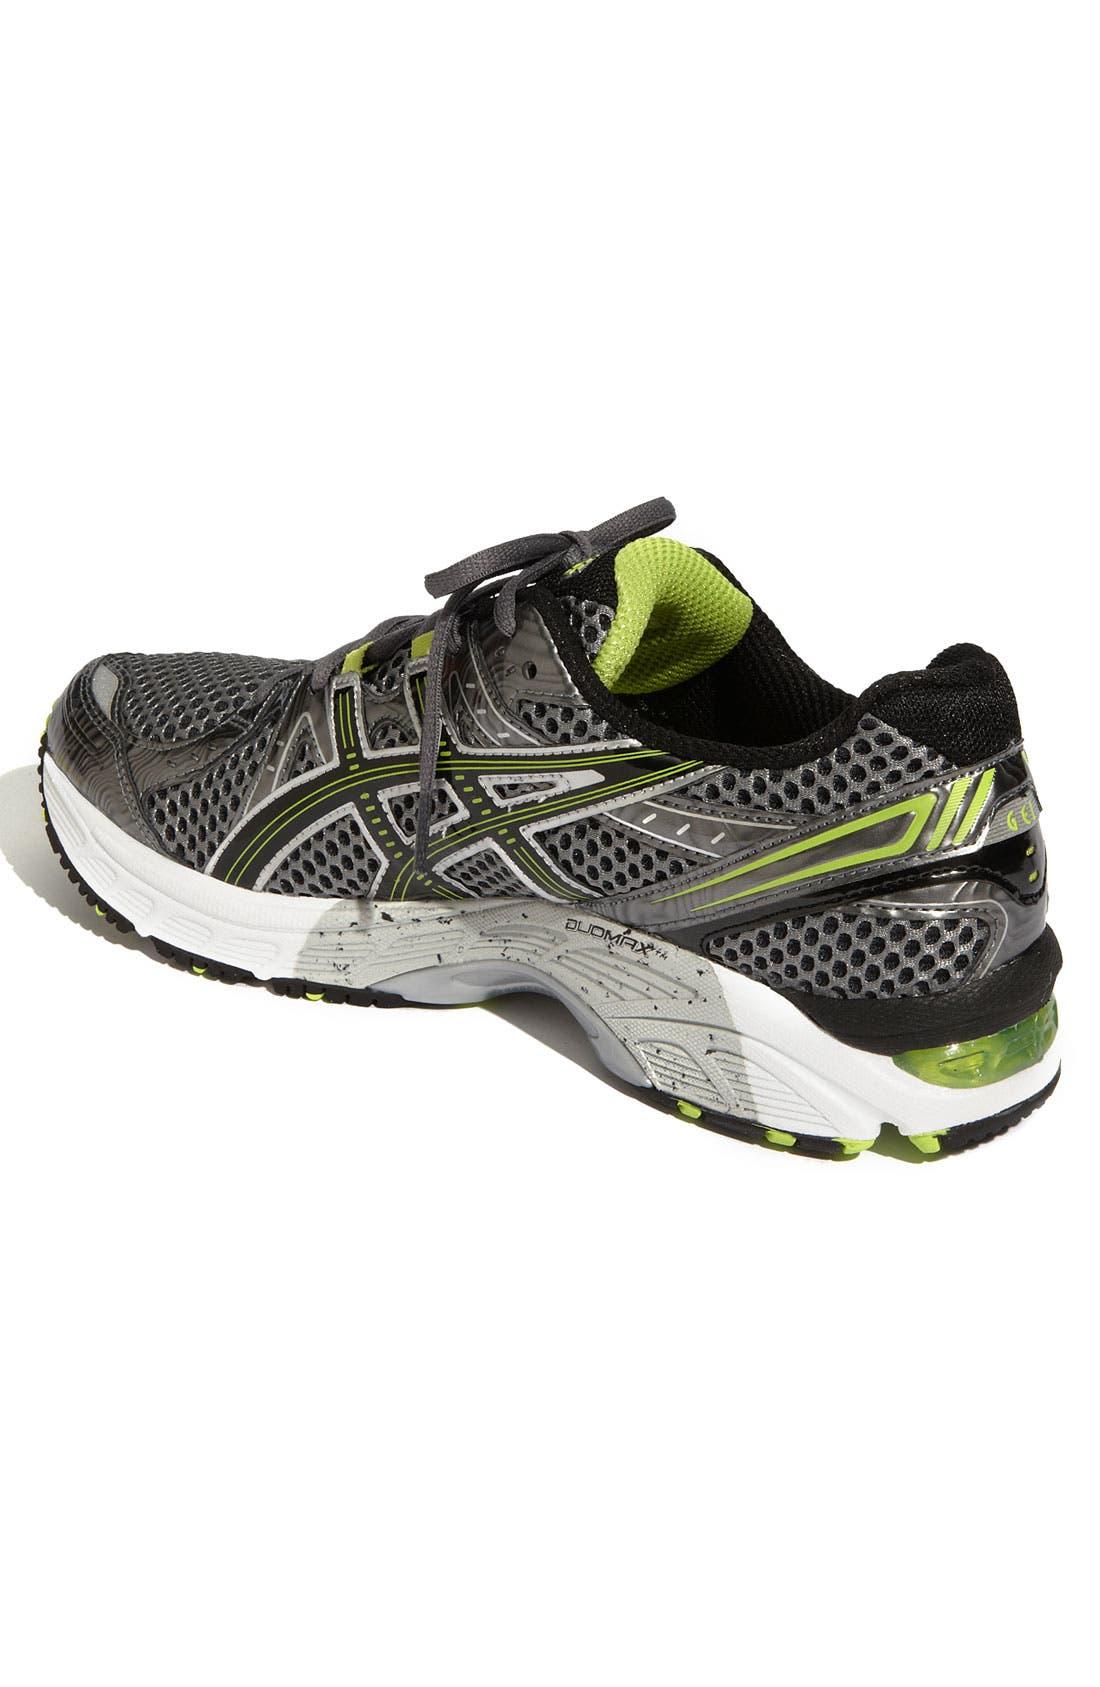 Alternate Image 3  - ASICS® 'Gel-1170™' Running Shoe (Men)